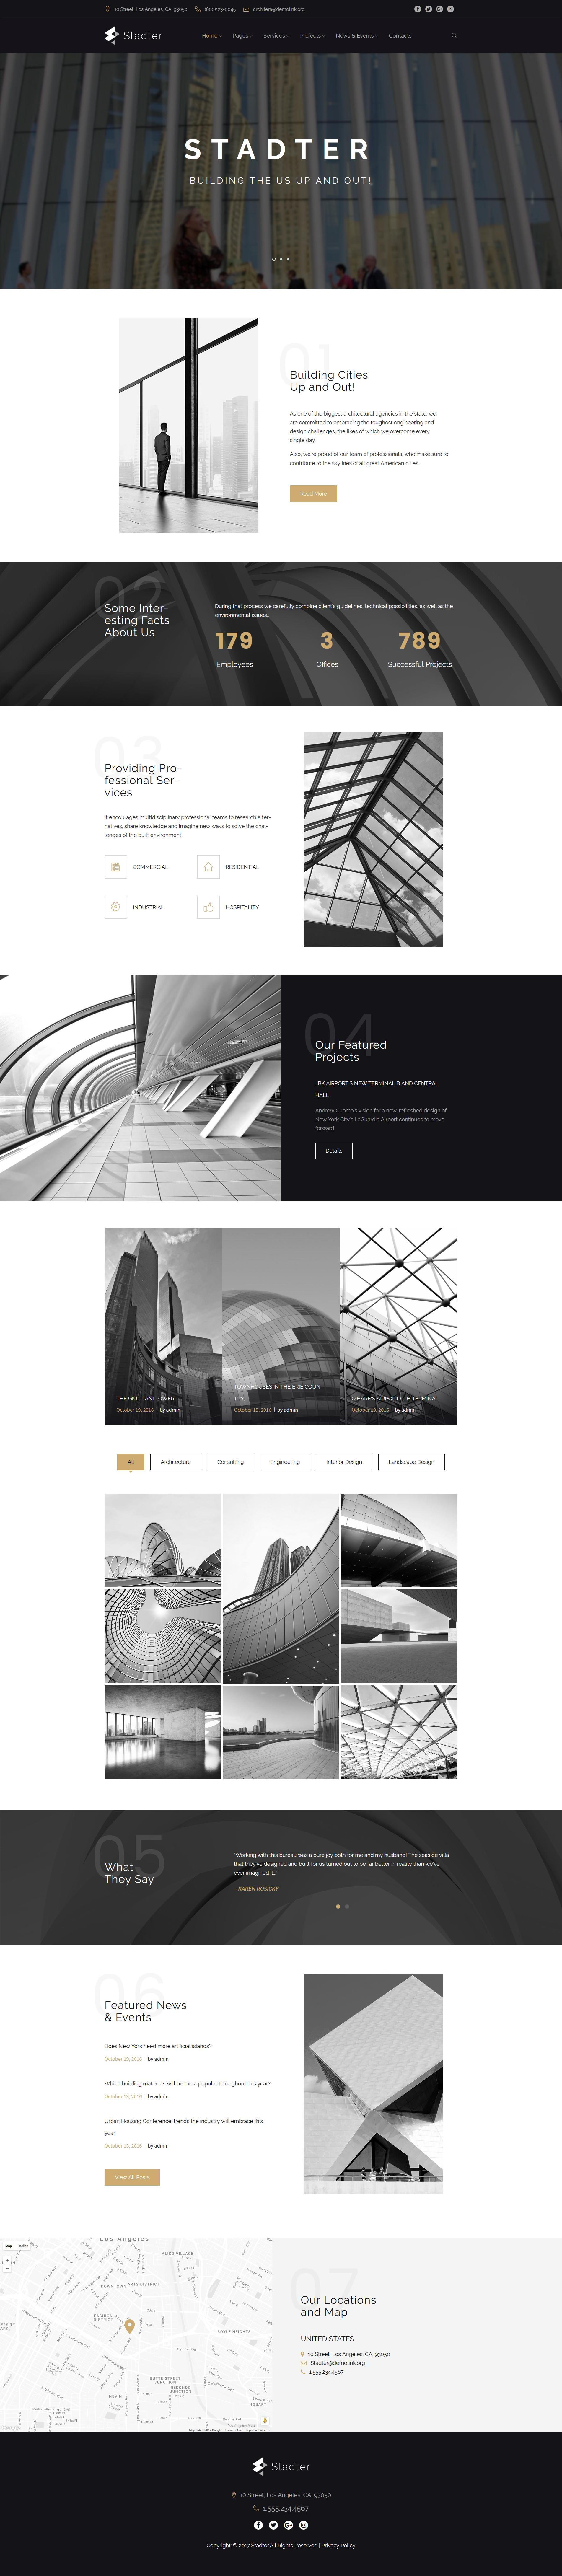 """Stadter - Construction Company"" 响应式WordPress模板 #63956 - 截图"